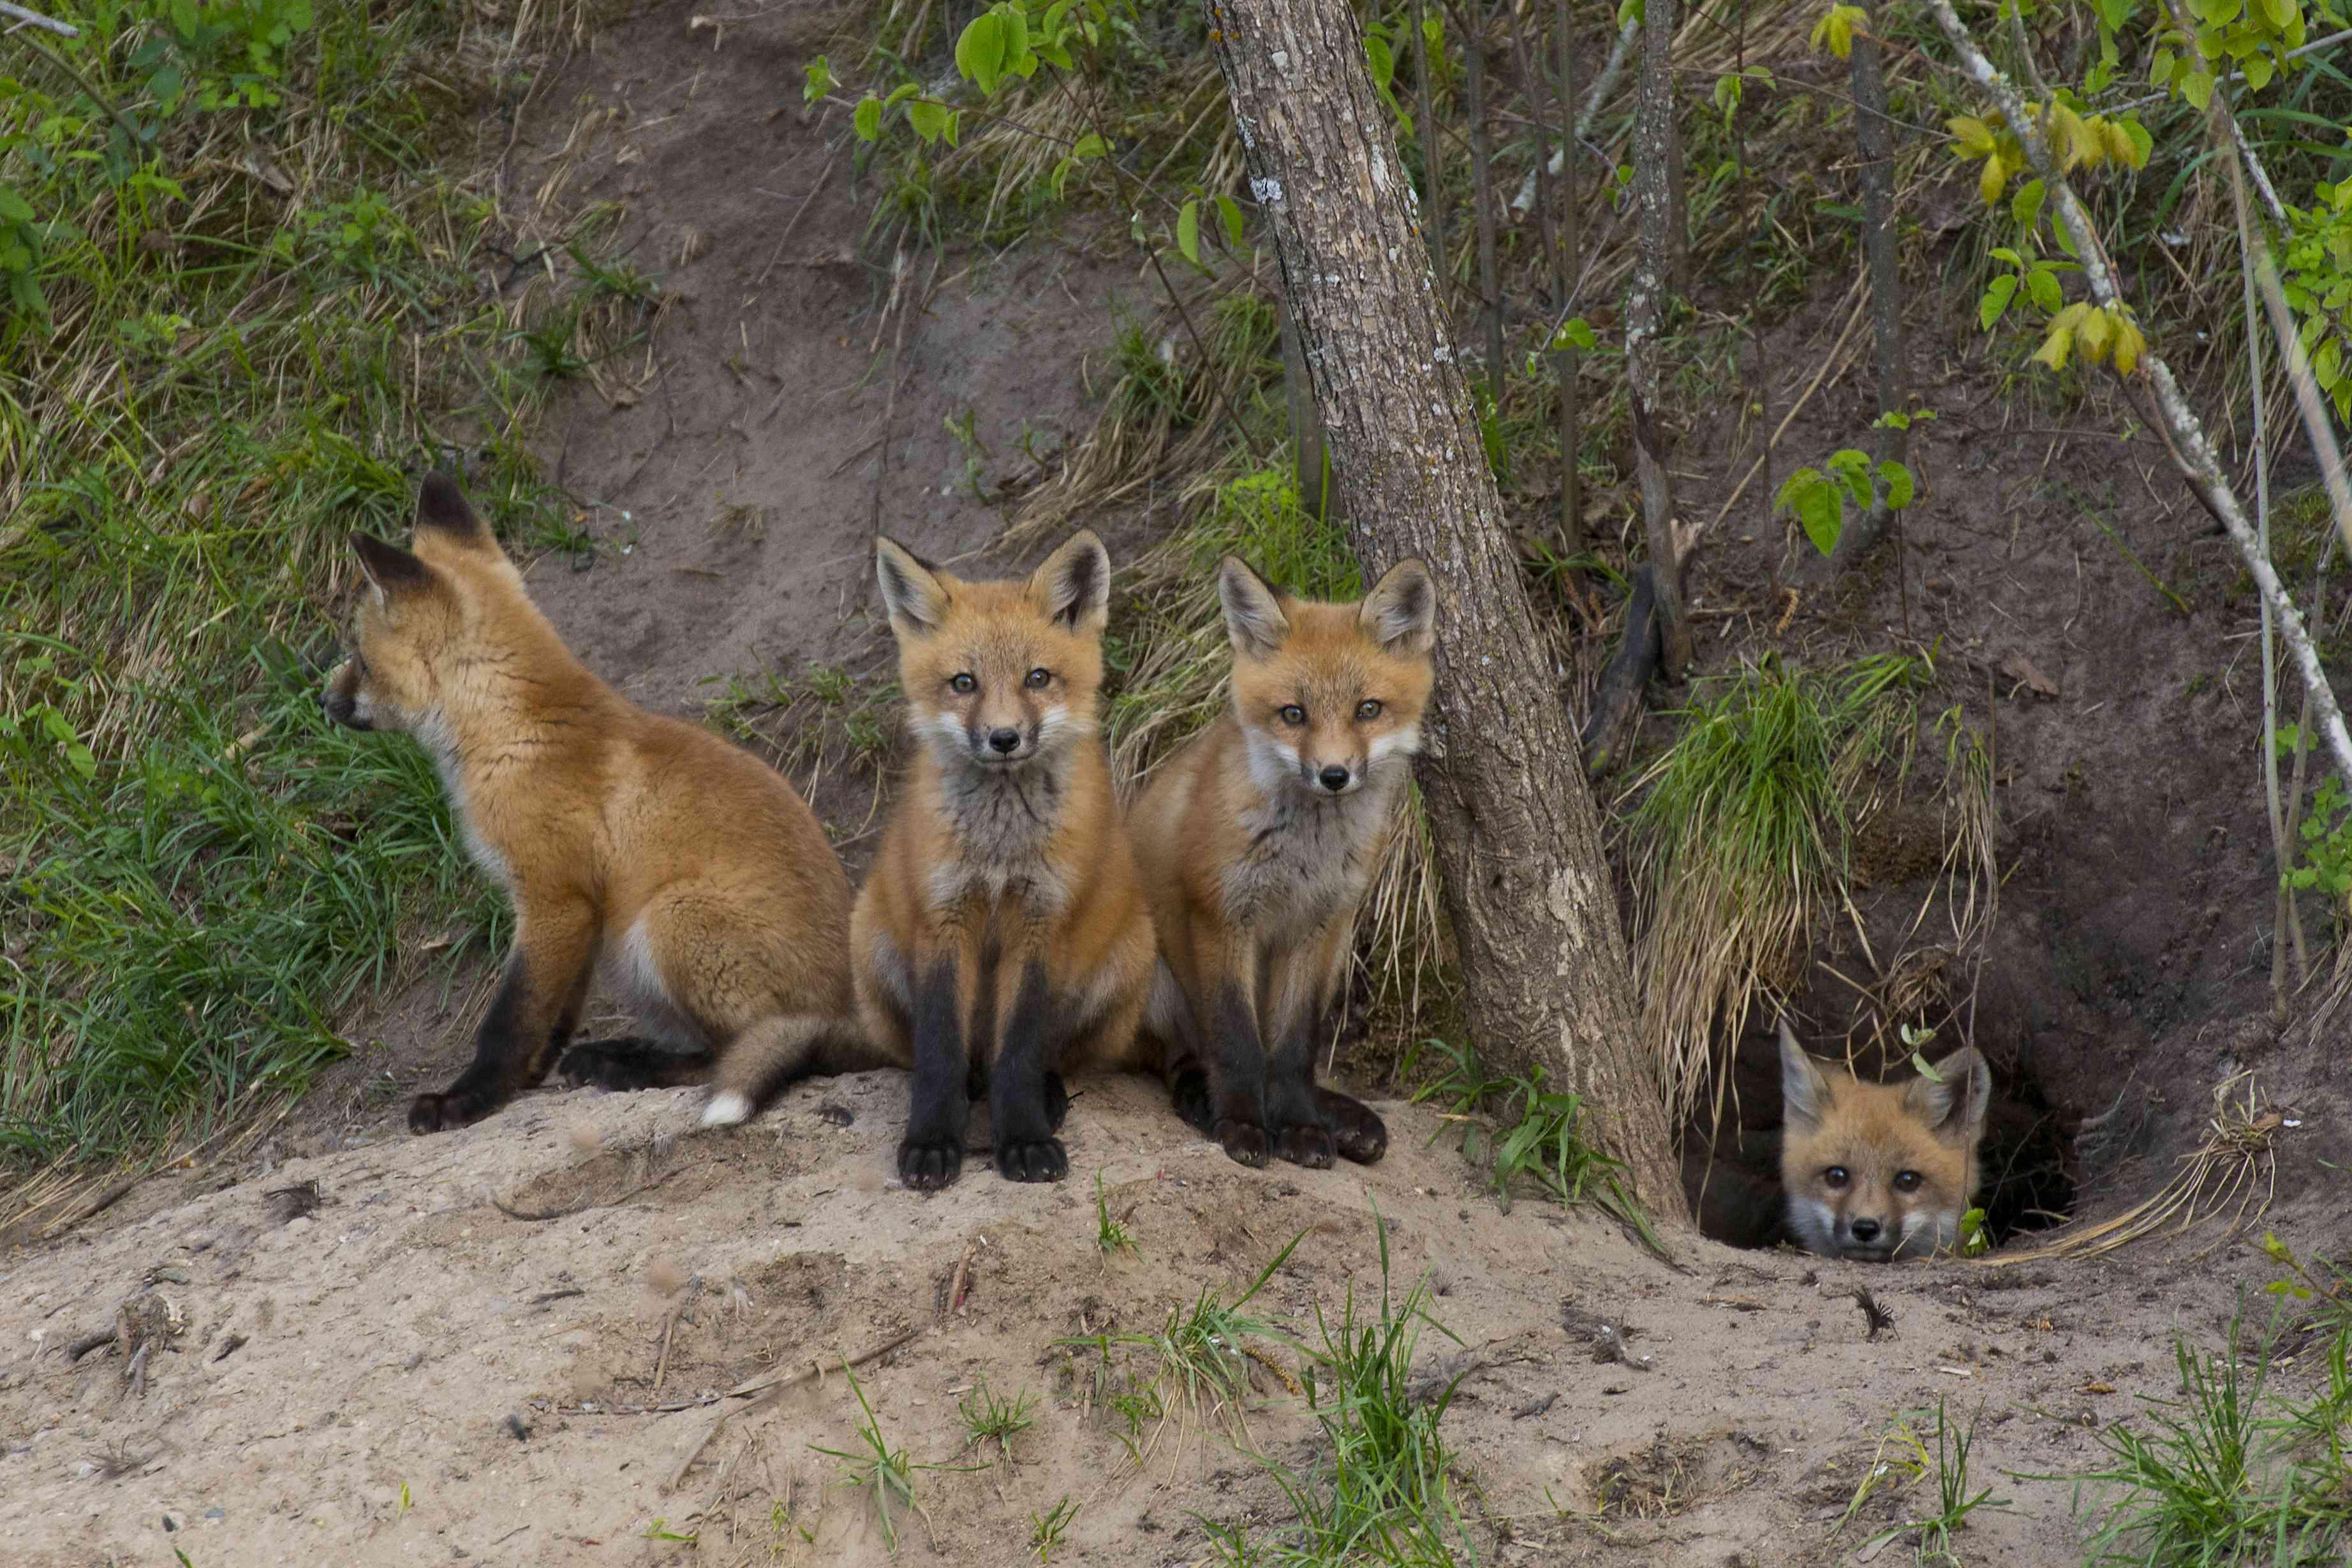 Quartet of baby foxes huddled around opening of burrow